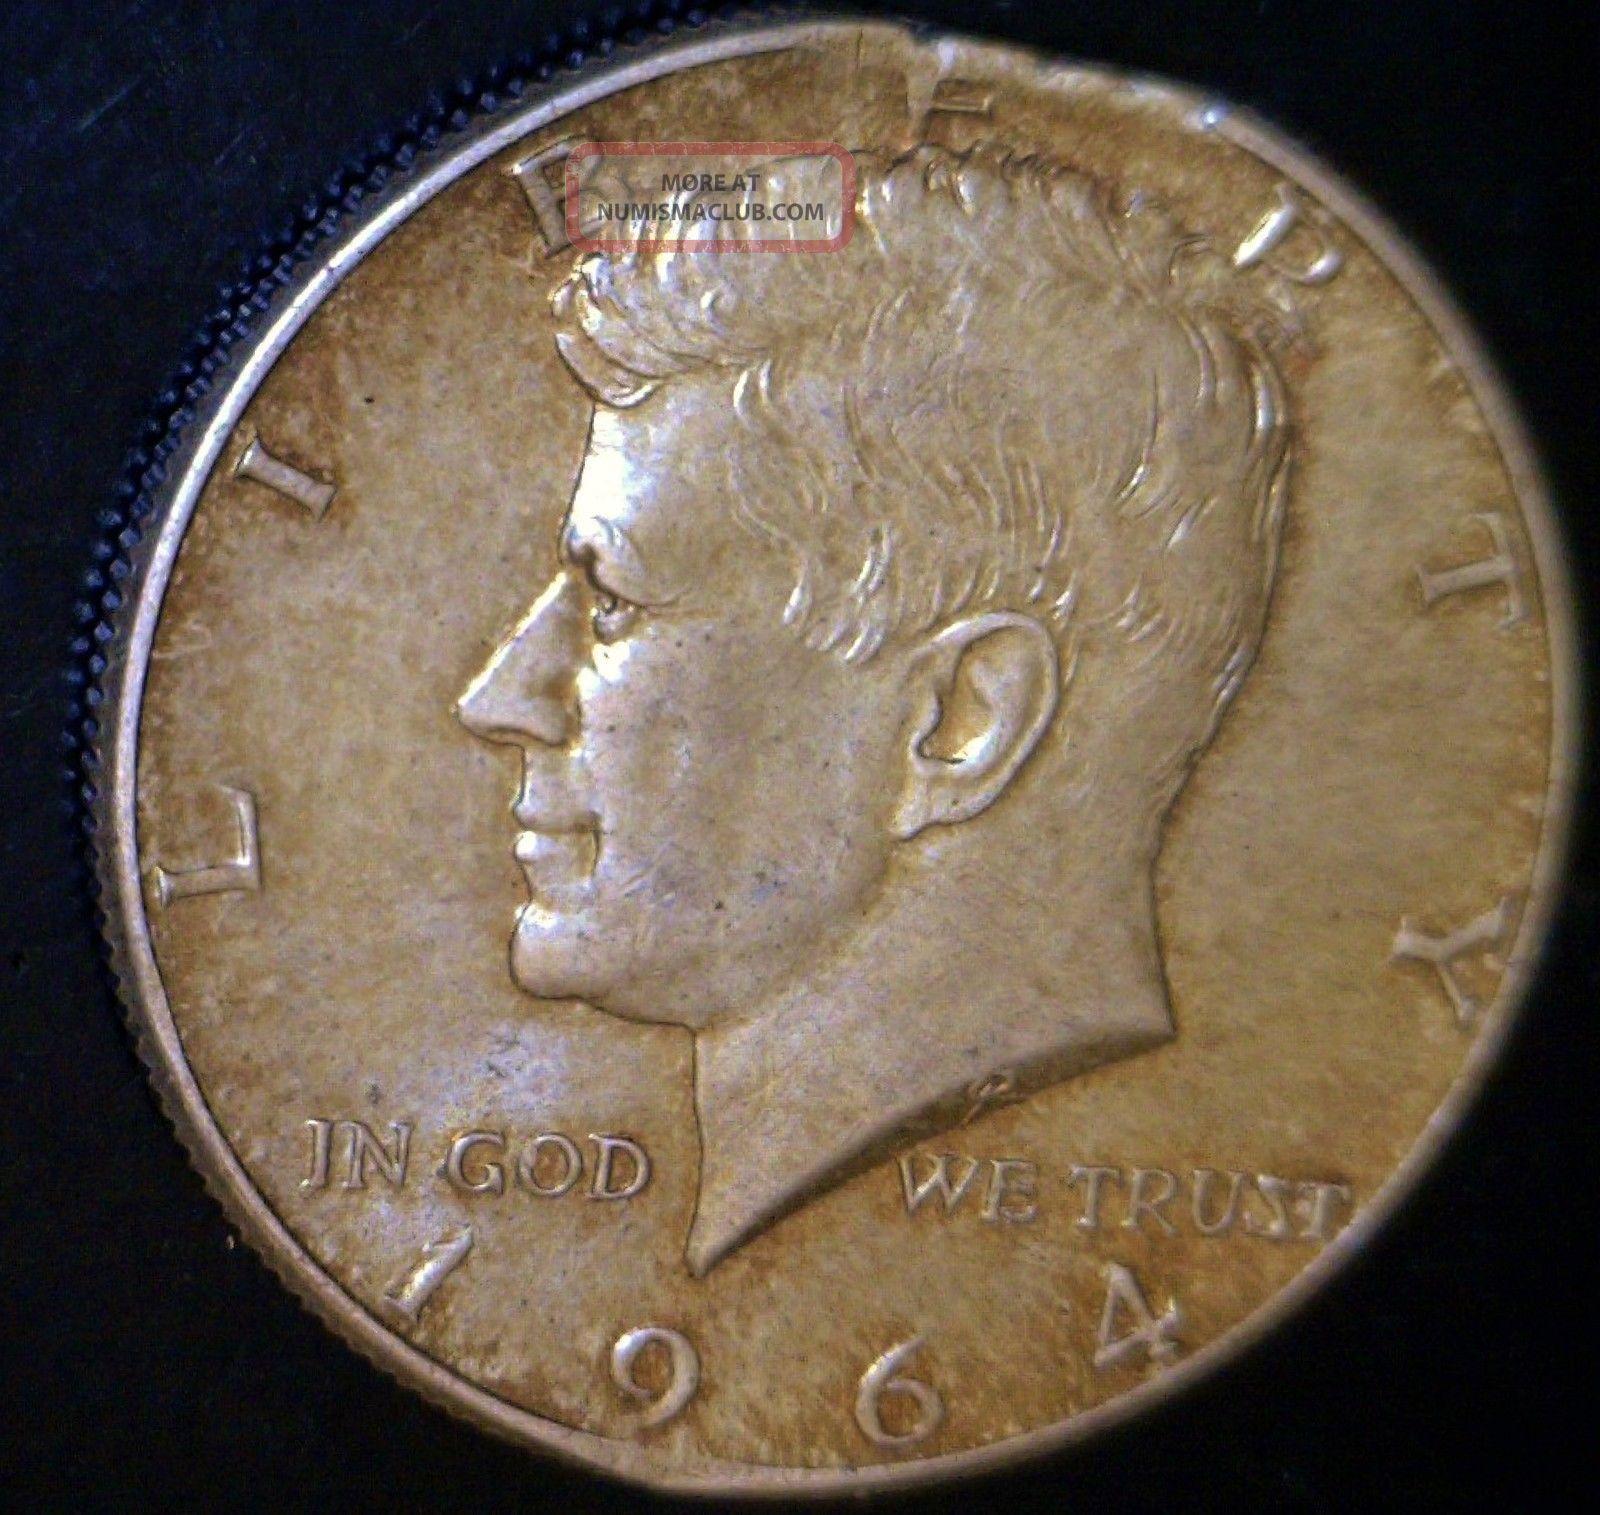 1964 Defective Planchet Error Silver Kennedy Half Dollar